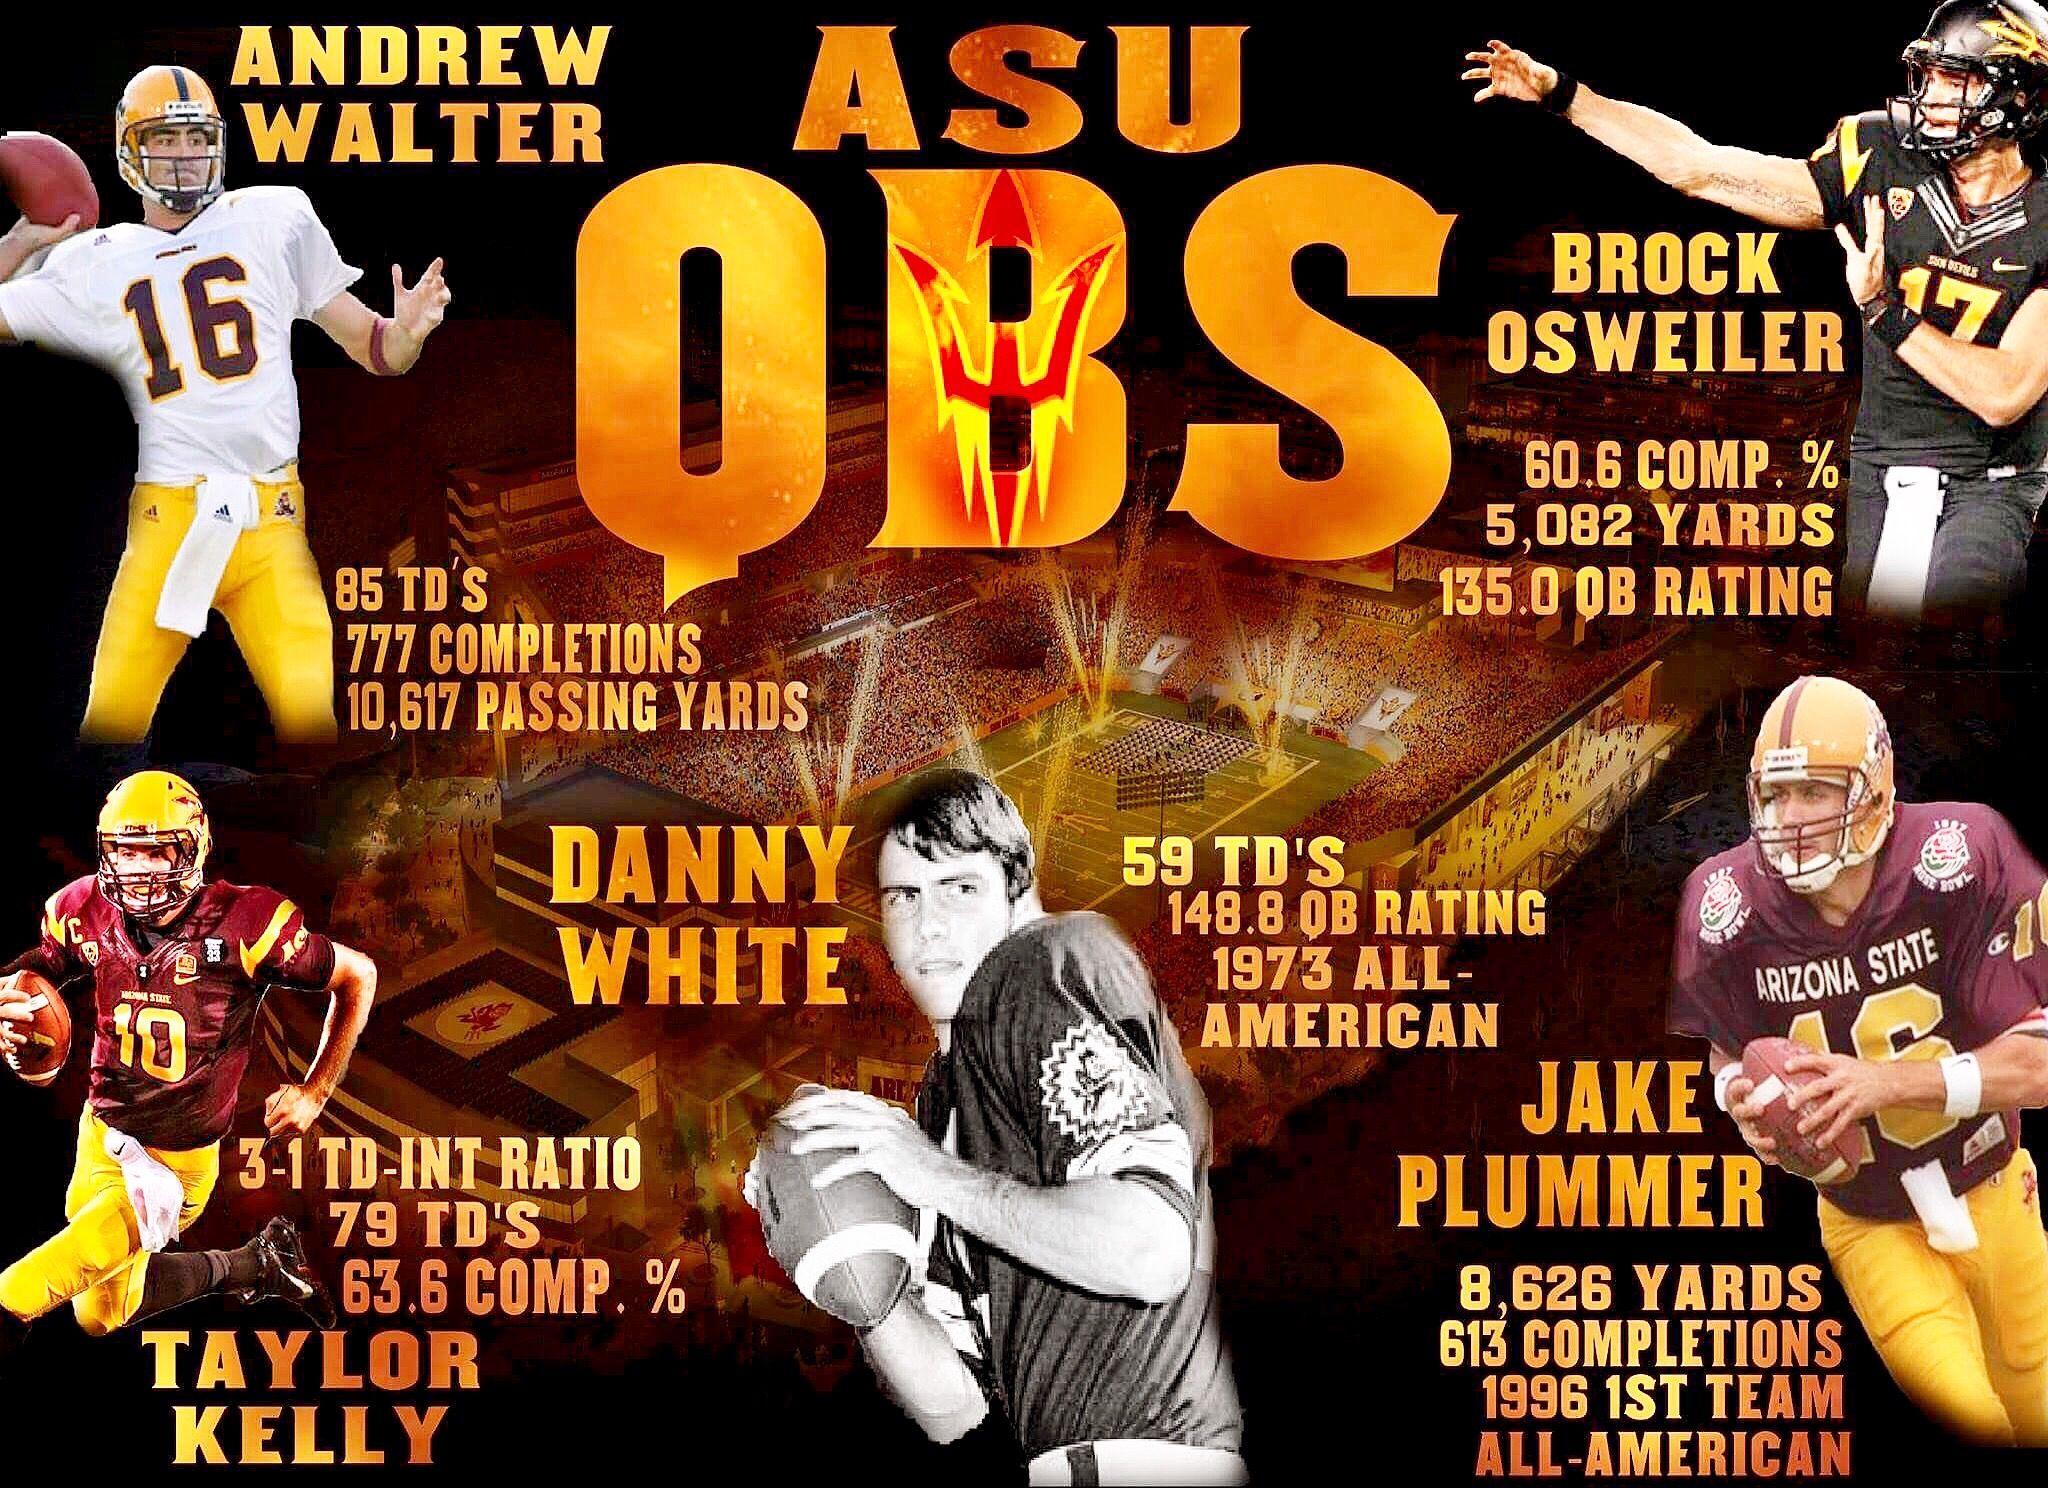 Forksup Sundevilfootball Arizona State University Arizona